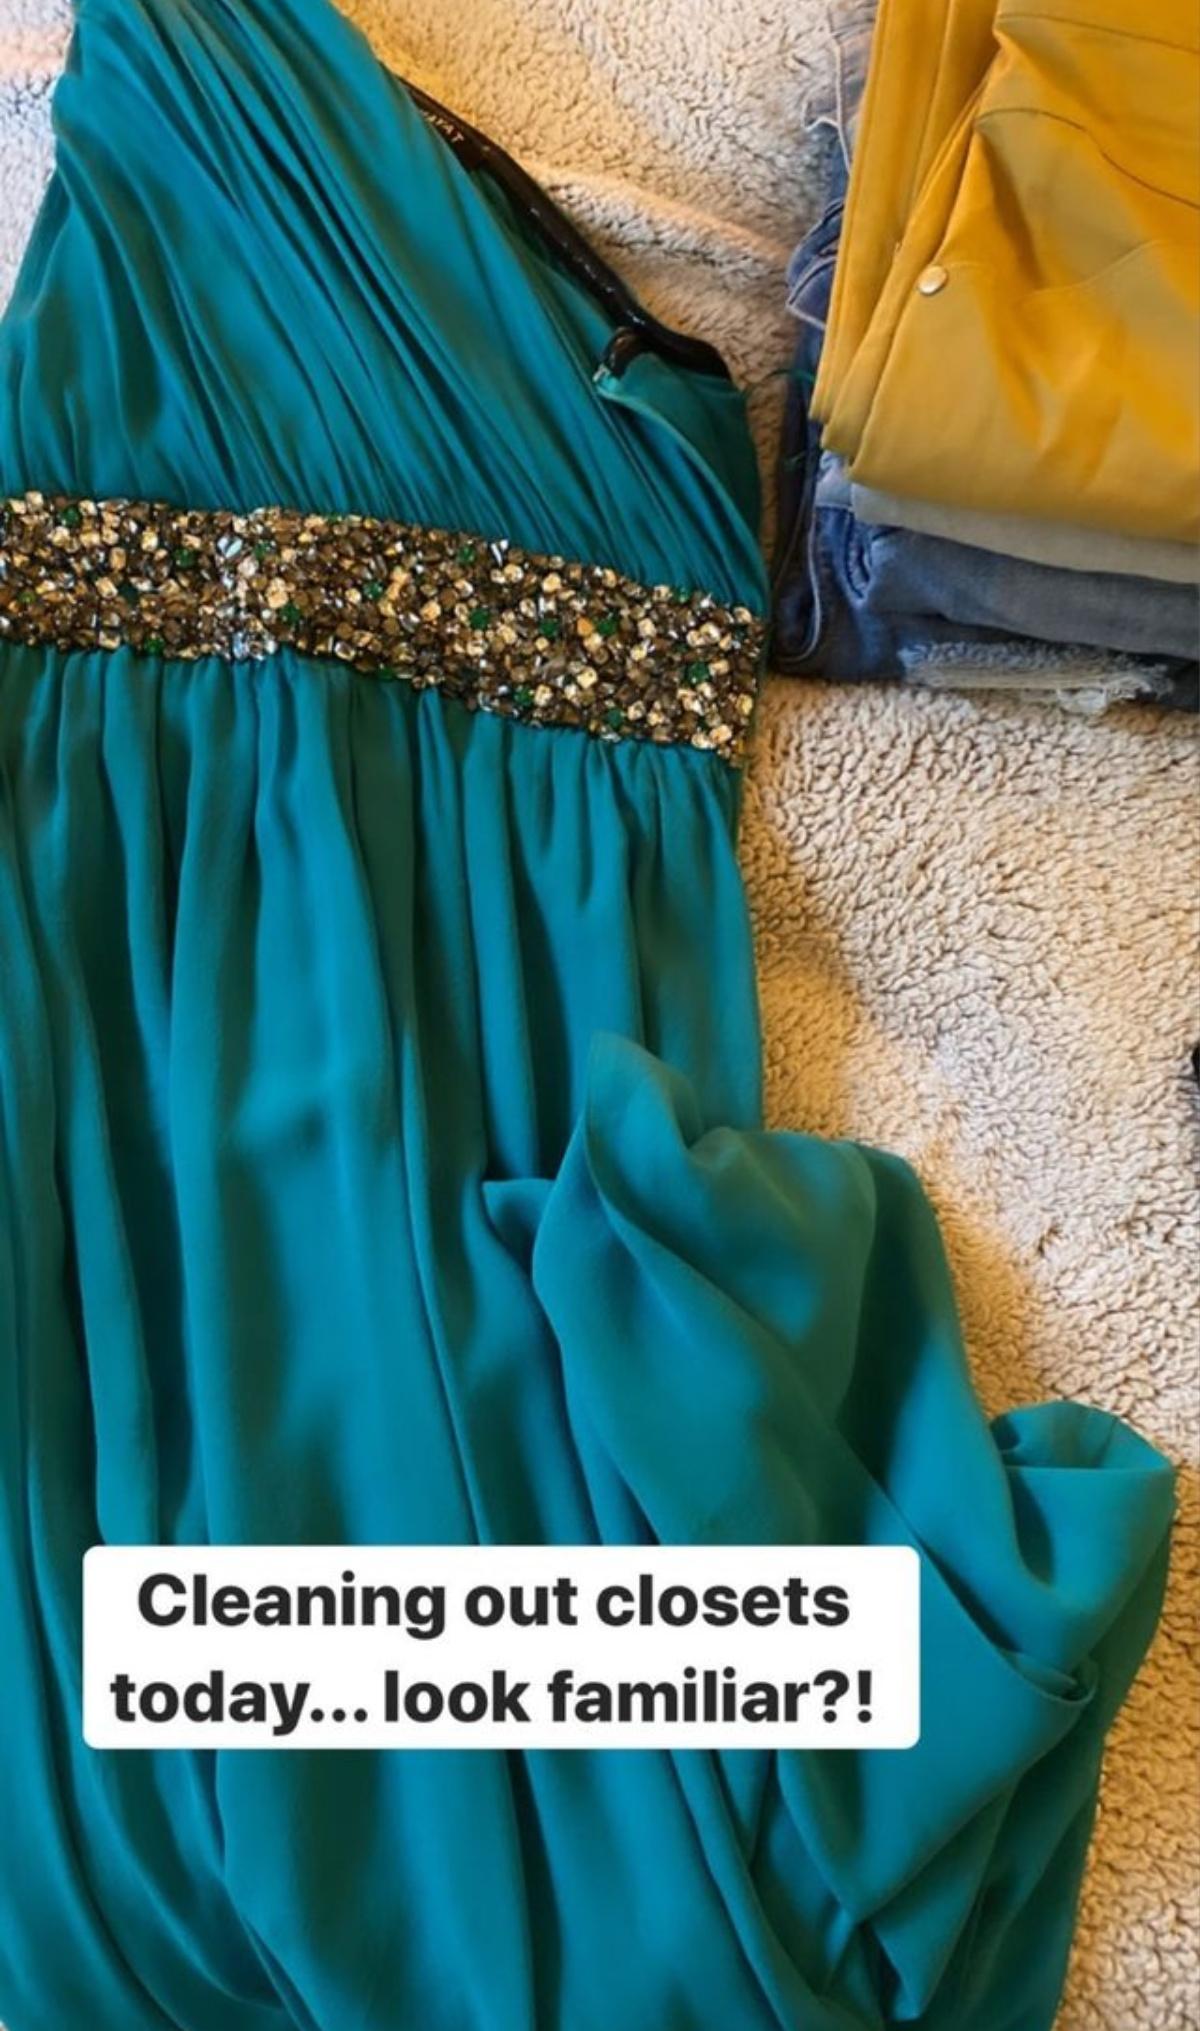 Clare's dress